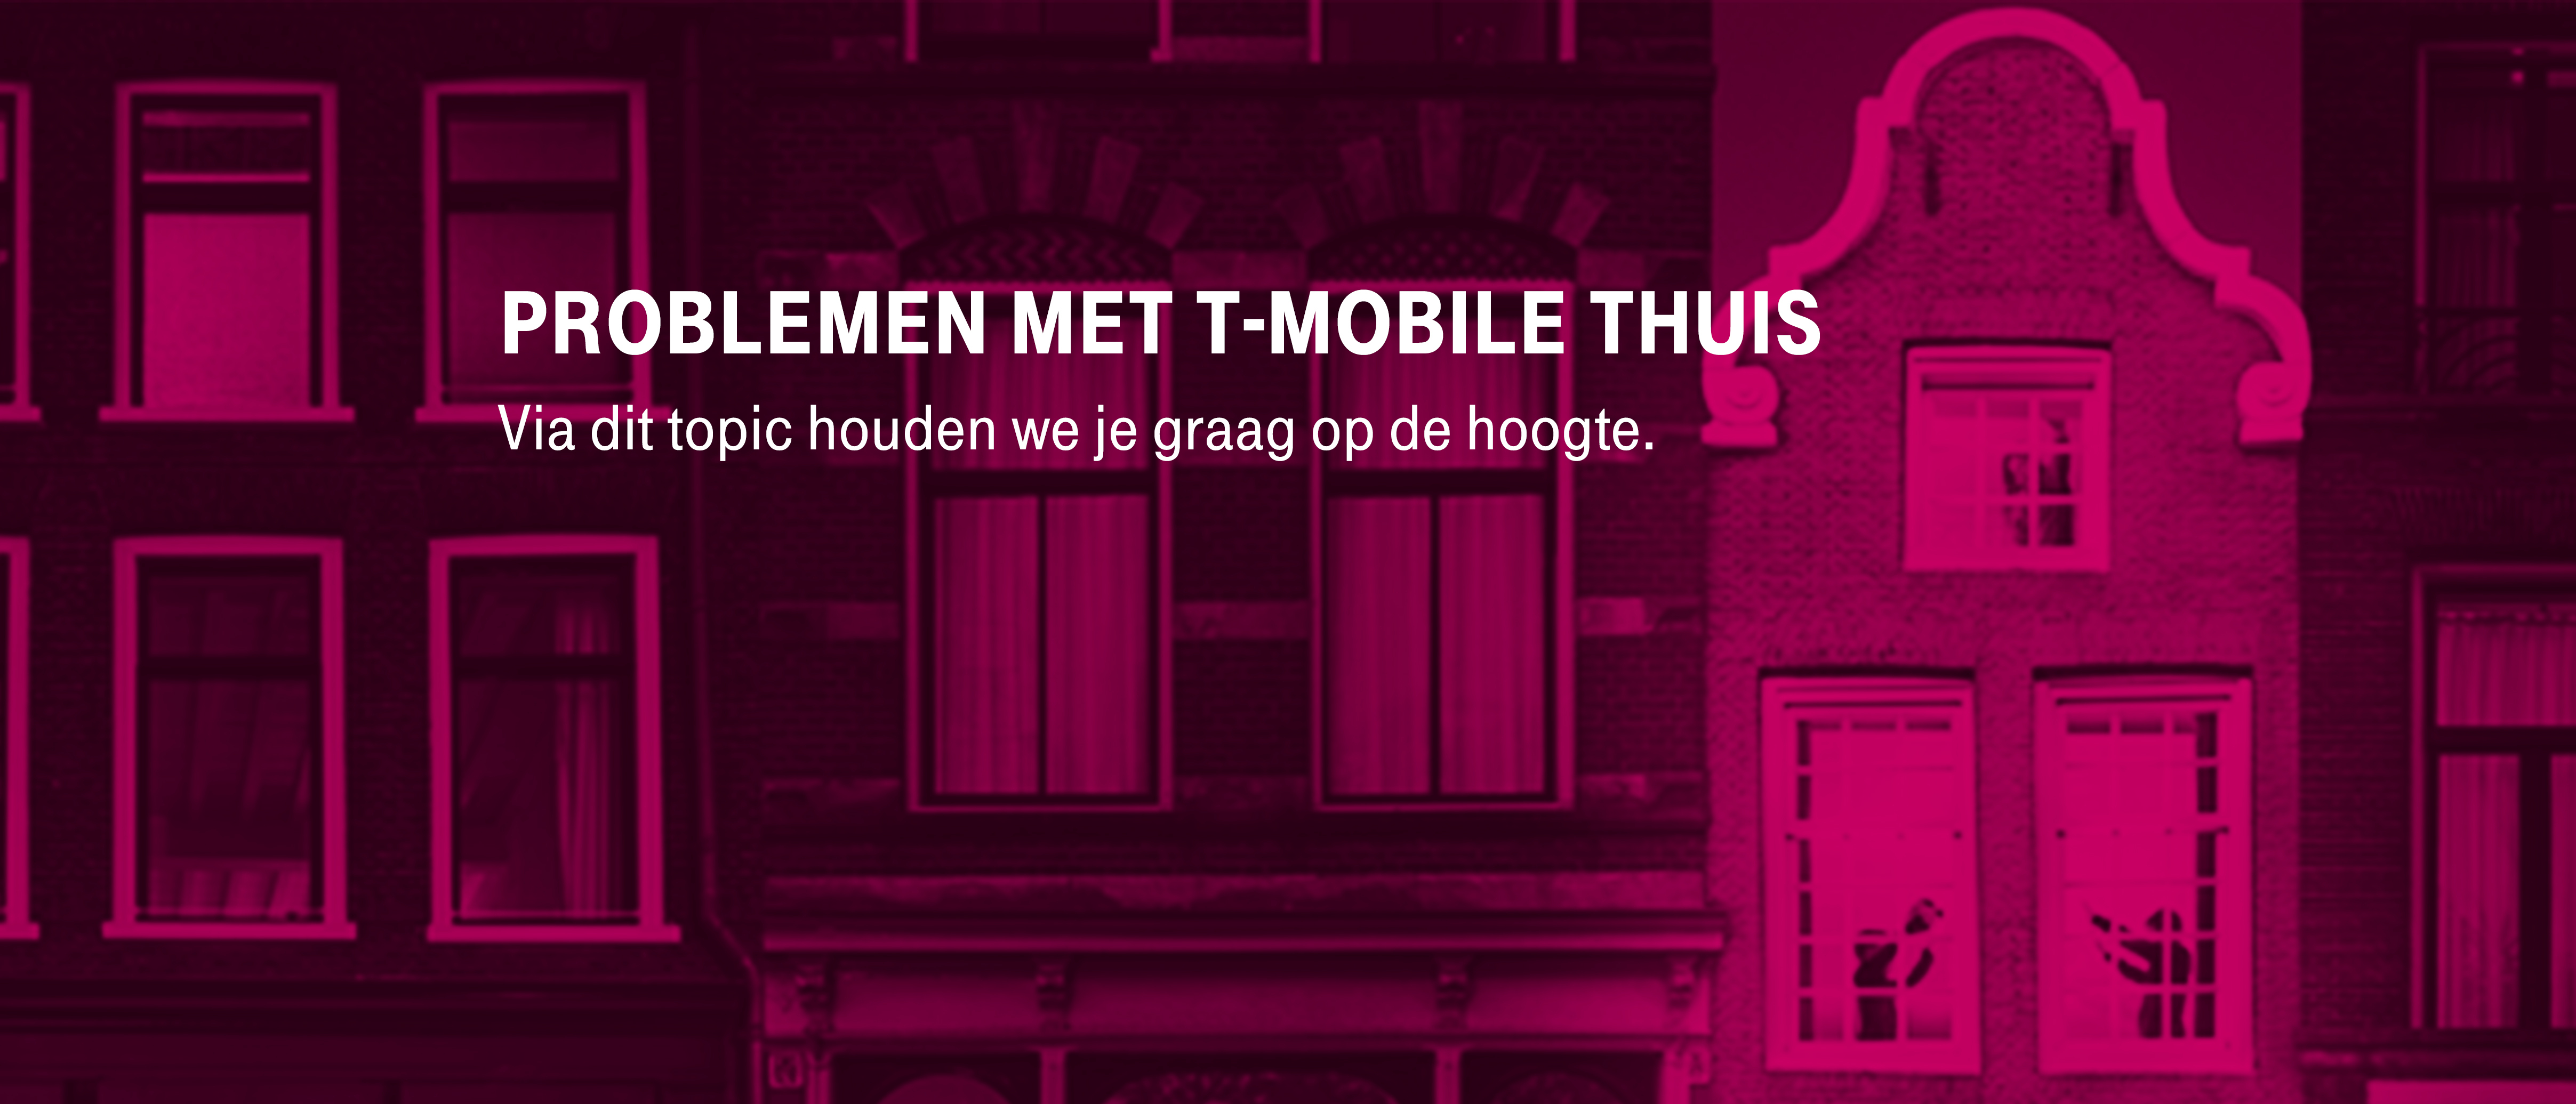 [Opgelost] Problemen vast internet T-Mobile Thuis 19-3-2019